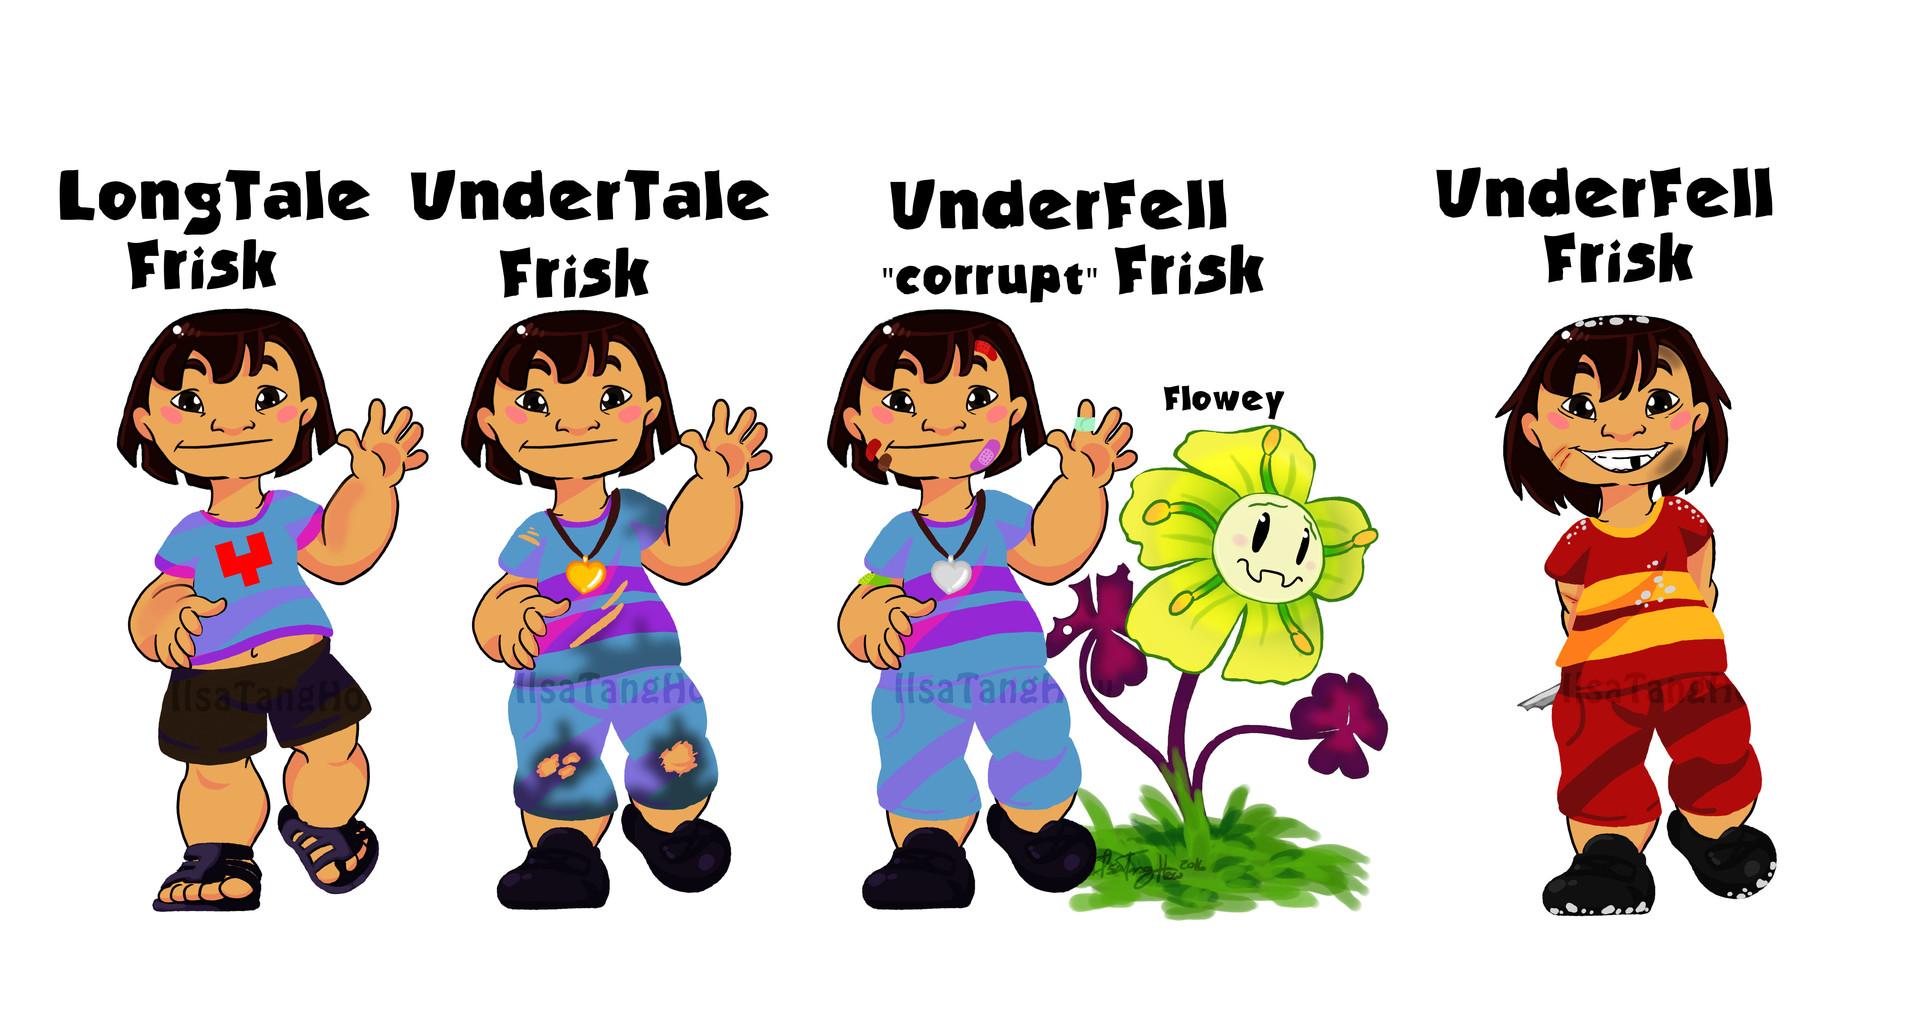 longtale animation - undertale